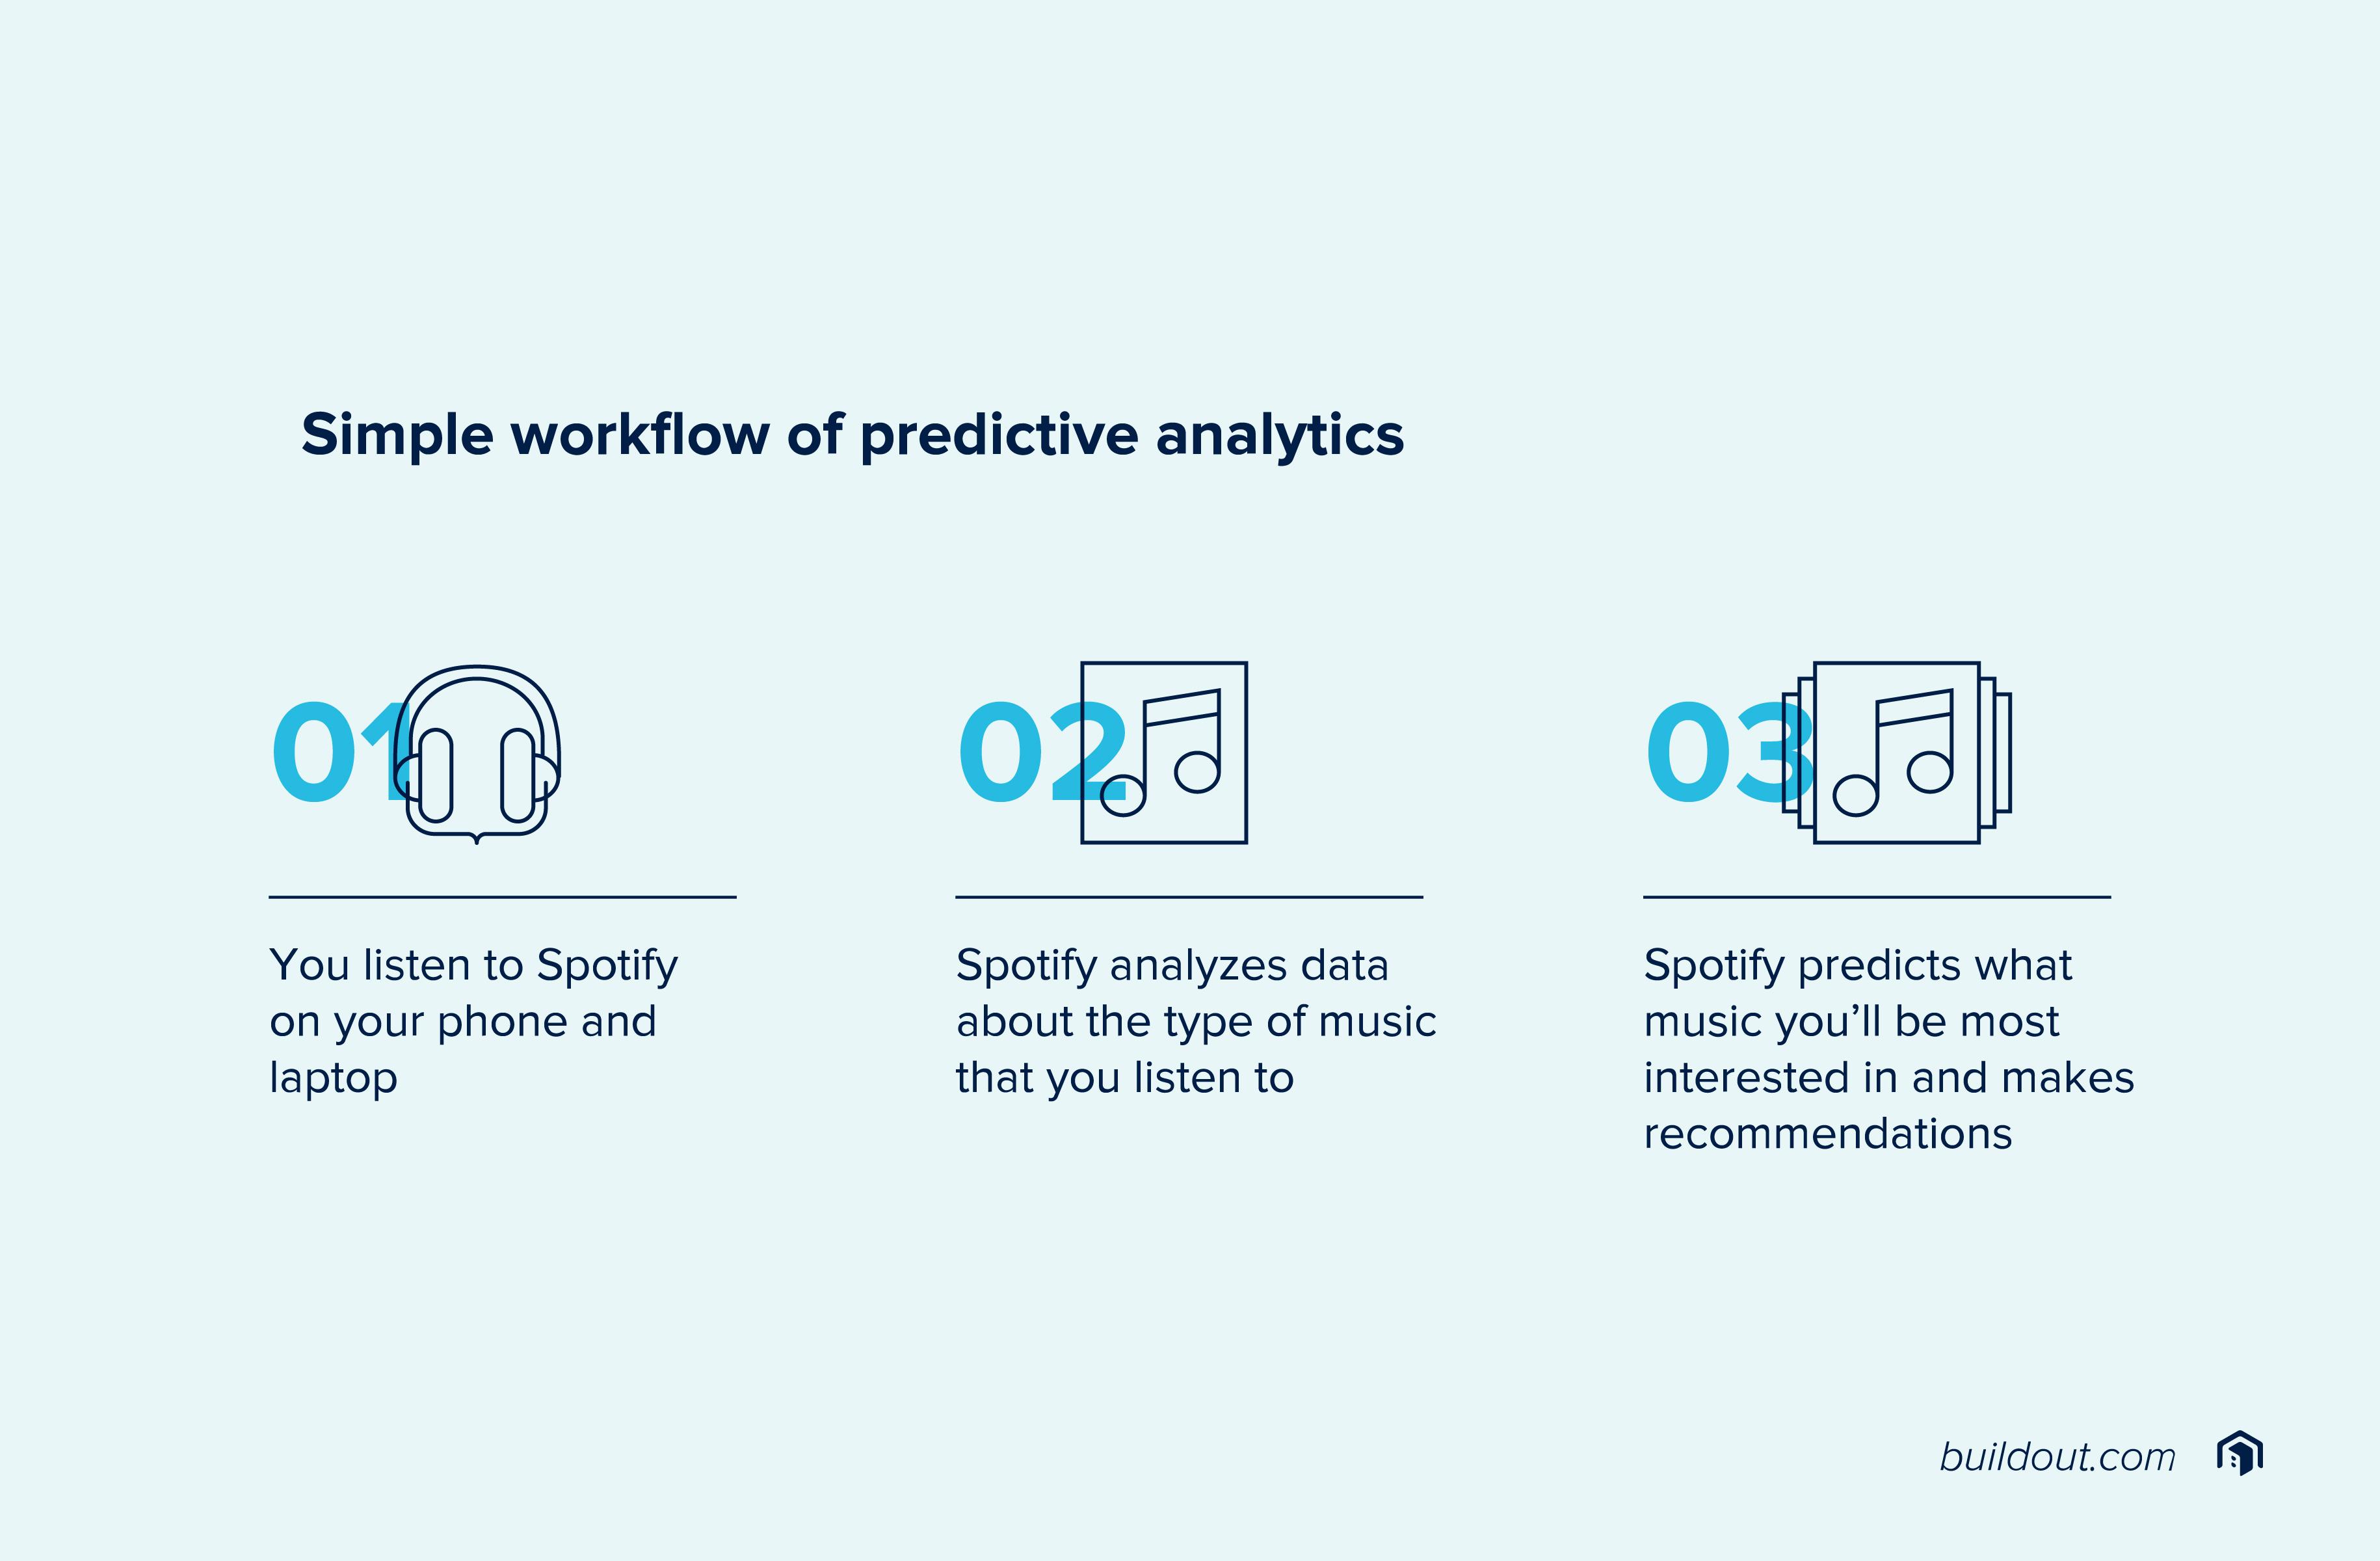 Simple workflow of predictive analytics